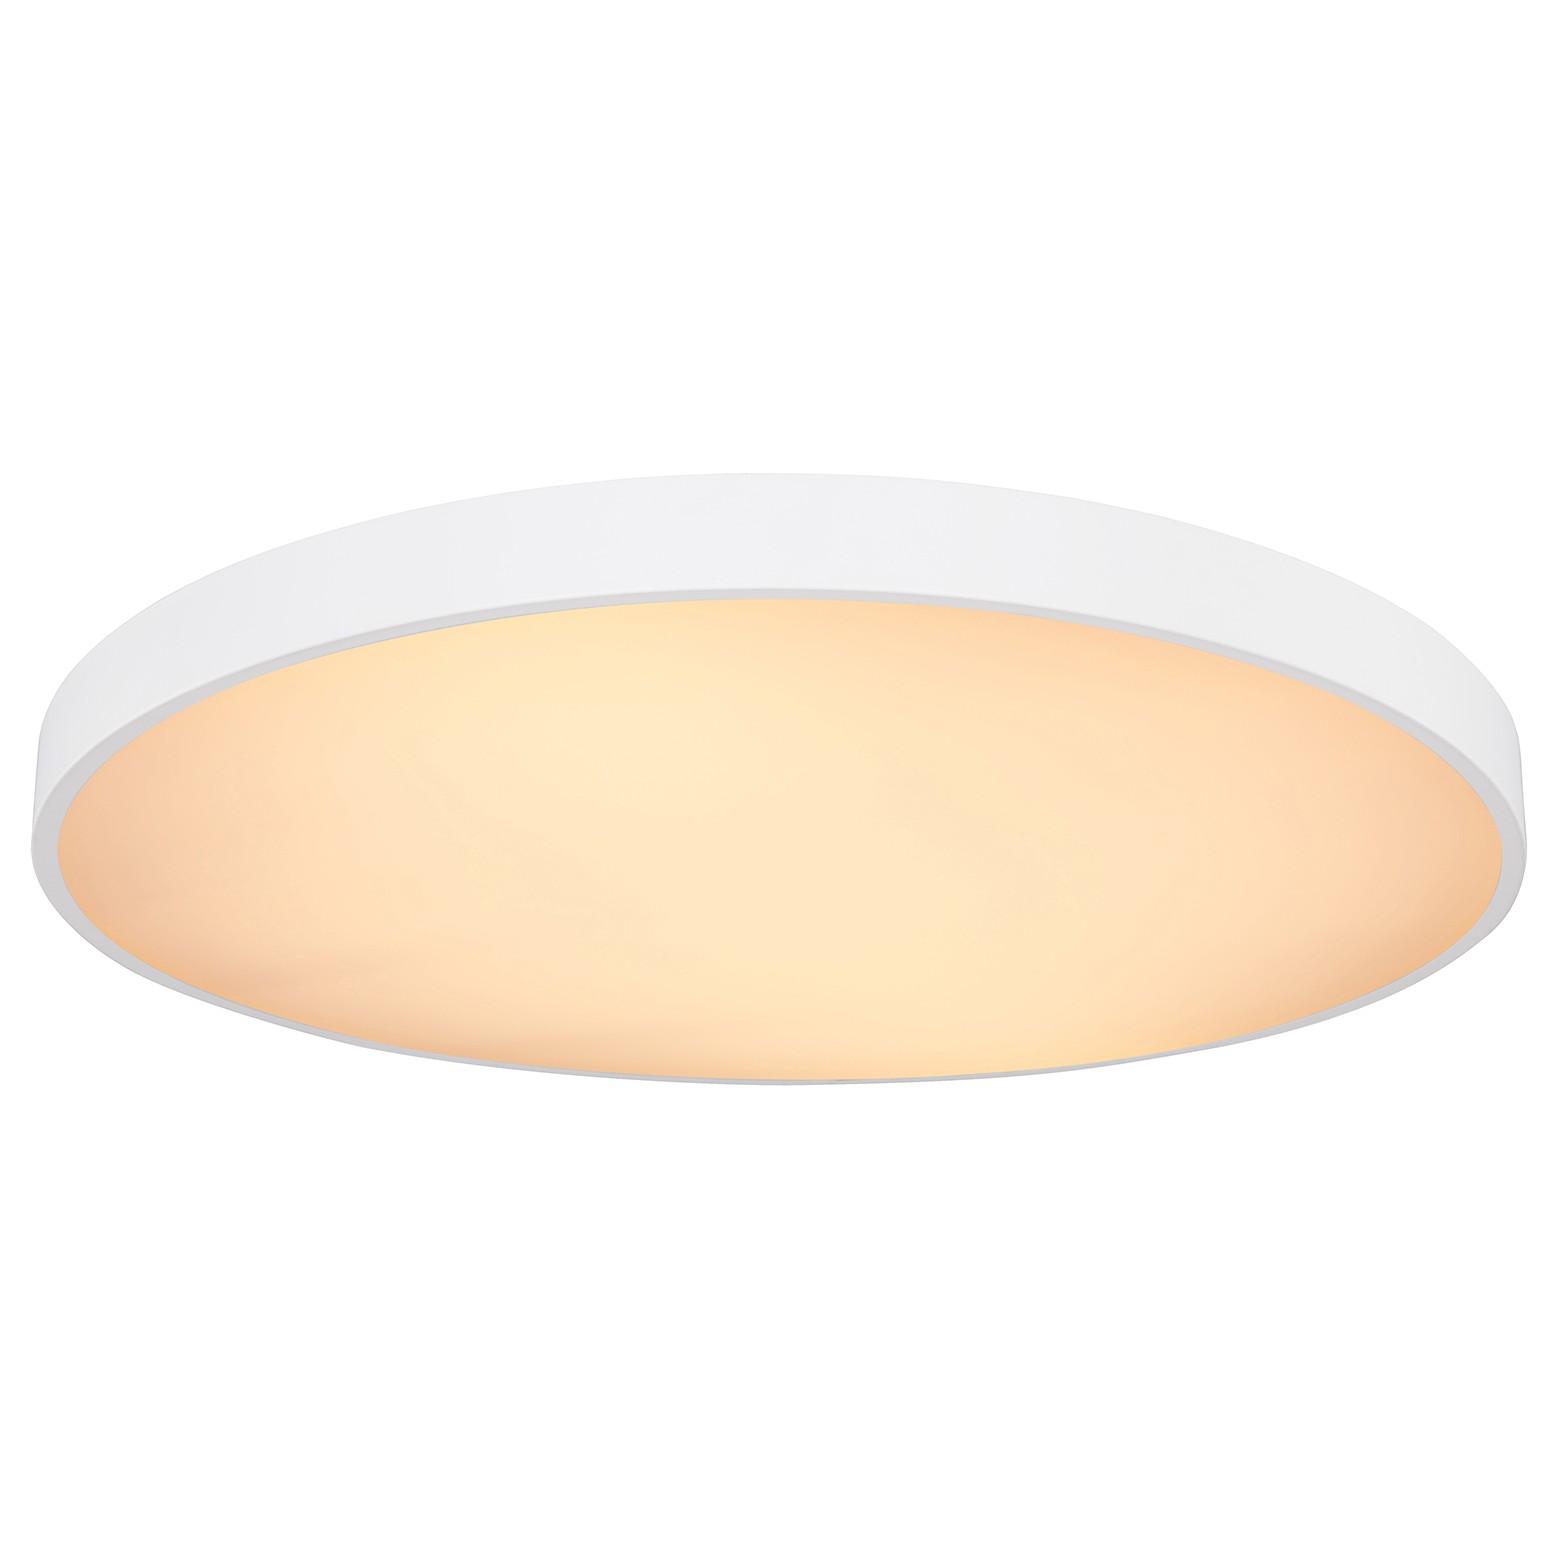 home24 LED-Deckenleuchte Wiss V